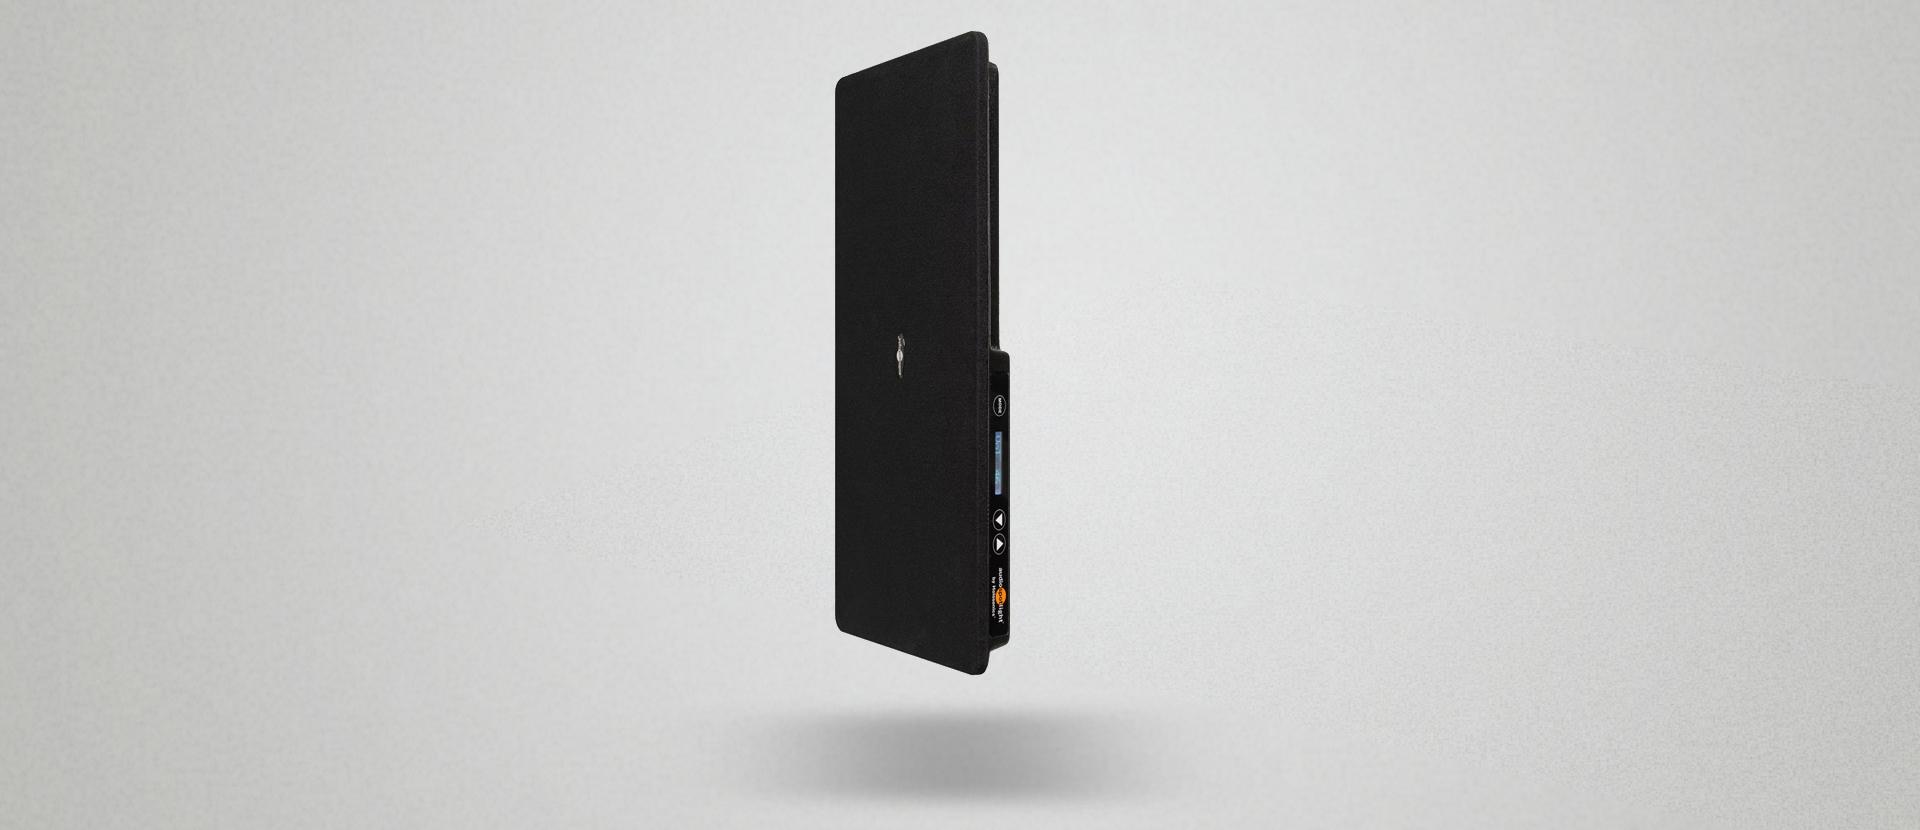 Ultraschalllautsprechersystem audiospotlight von molitor